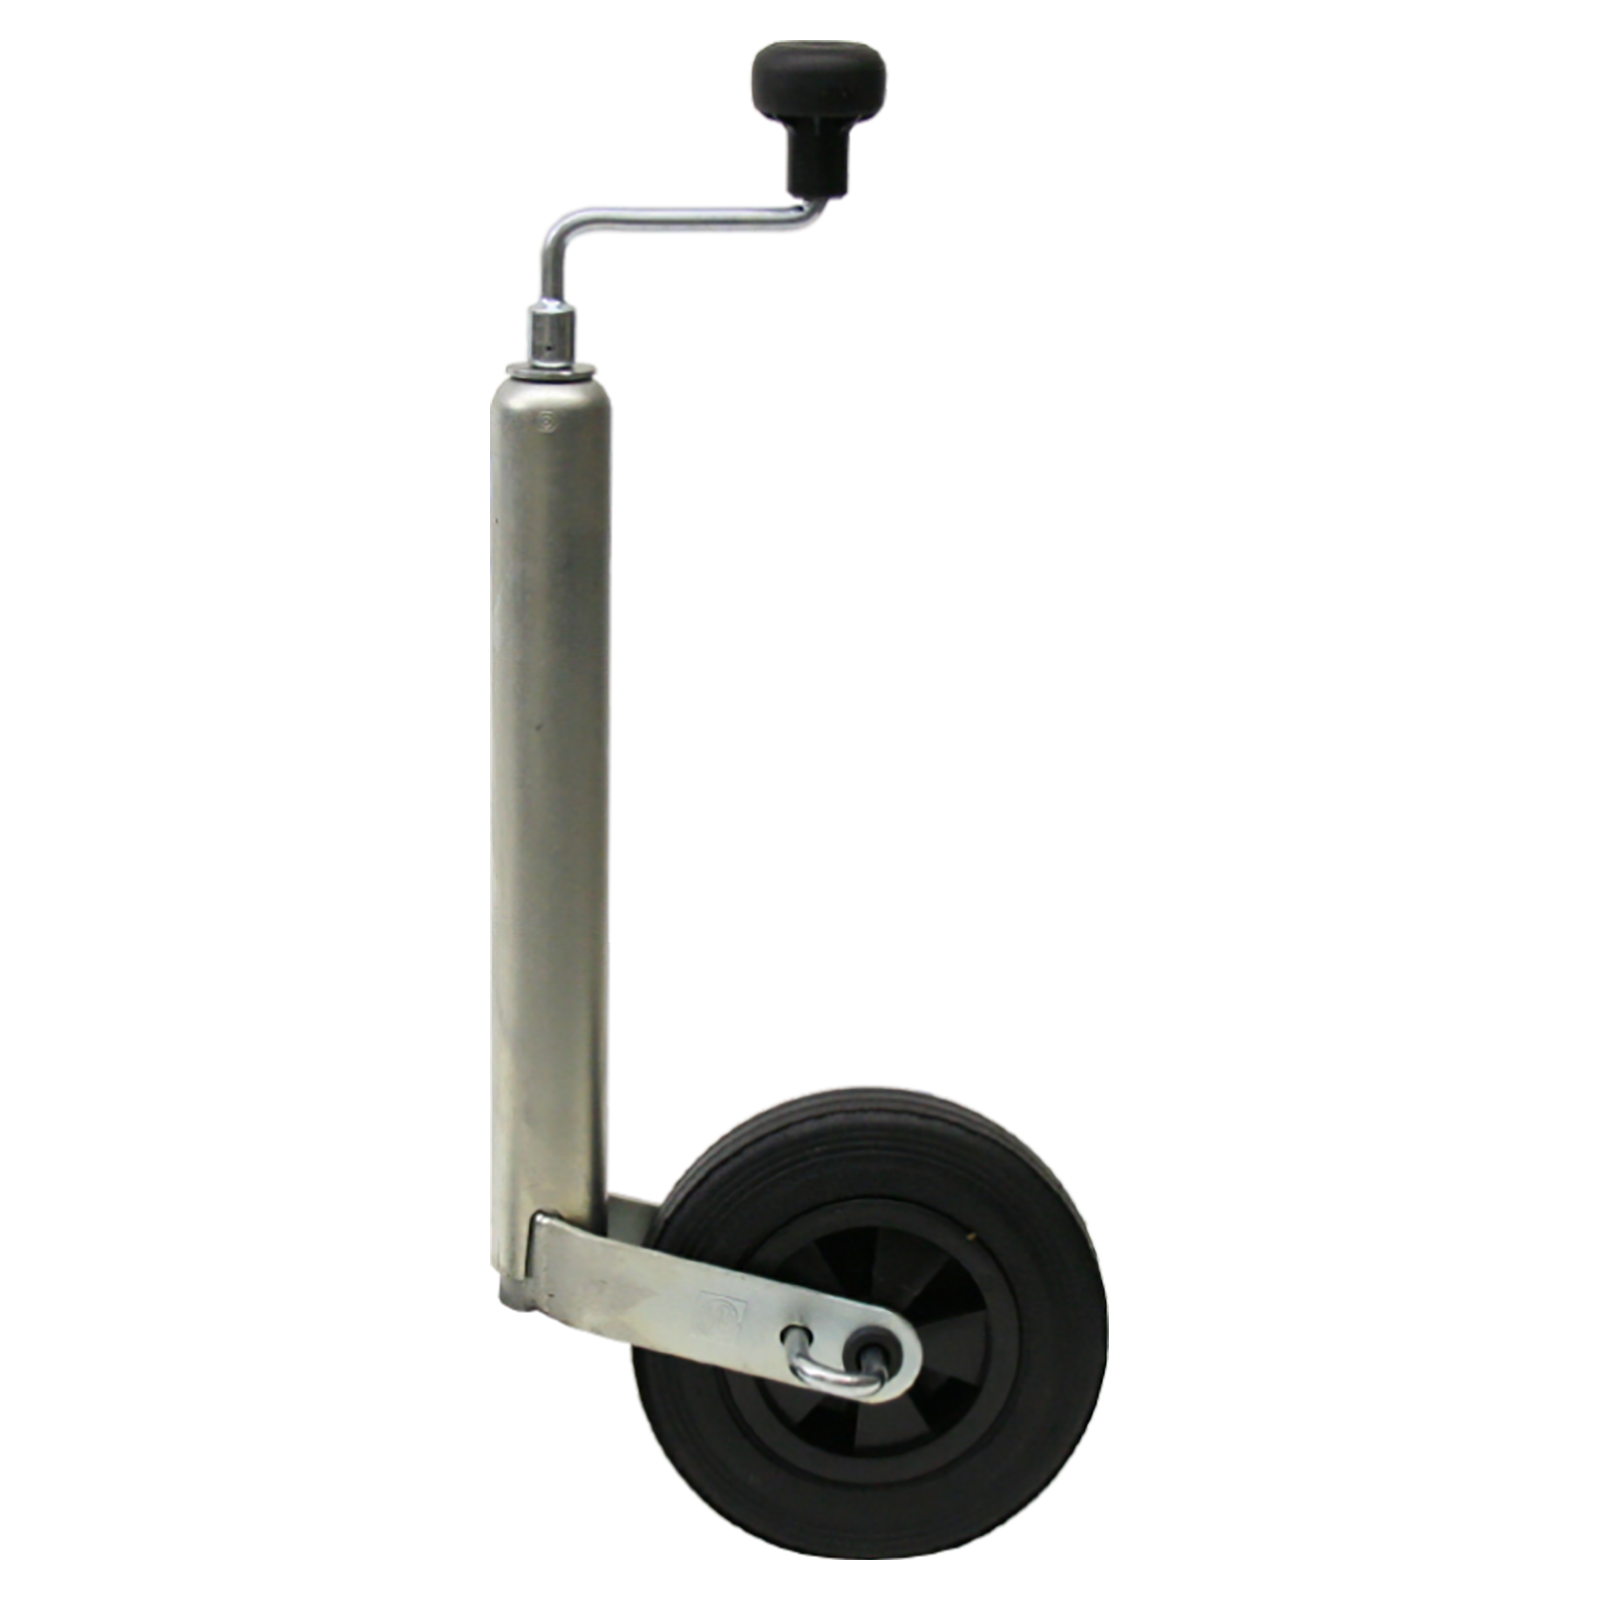 roue jockey erde telescopique 150 kg 48 mm diametre avec frein a main chez rameder. Black Bedroom Furniture Sets. Home Design Ideas